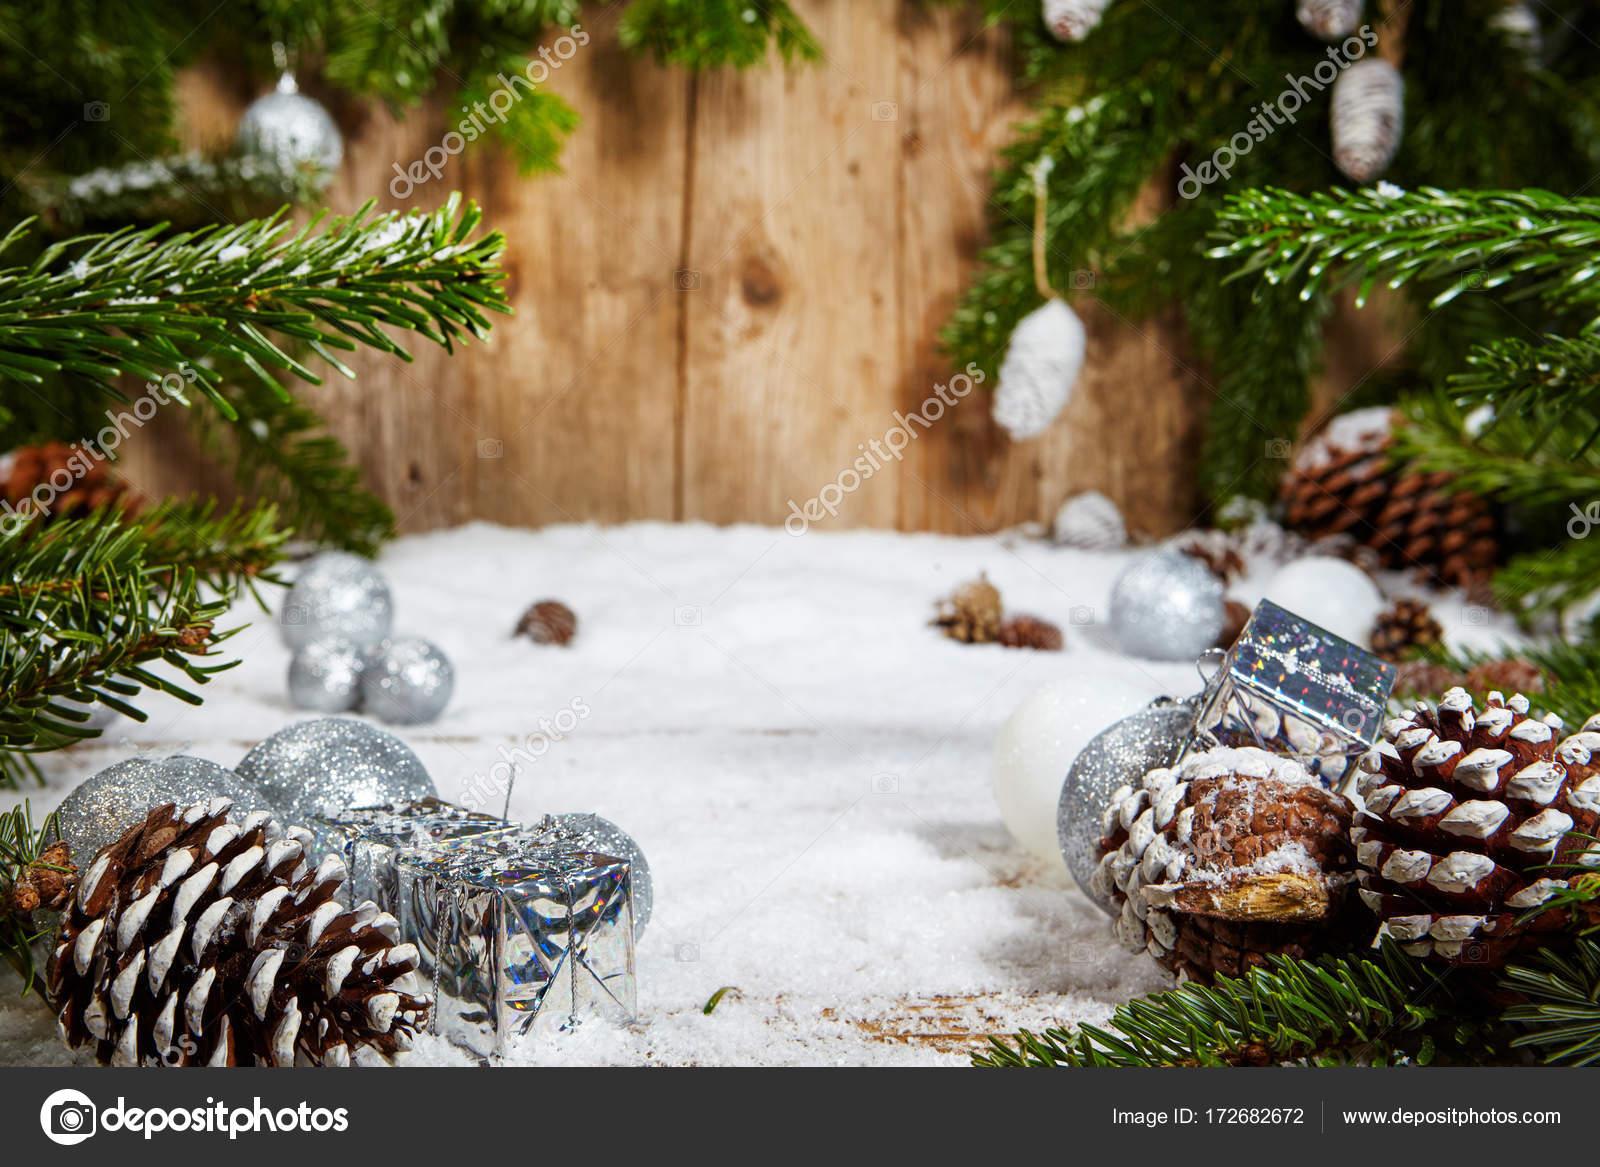 Beautiful Christmas Background Images.Beautiful Christmas Background Stock Photo C Zoomteam